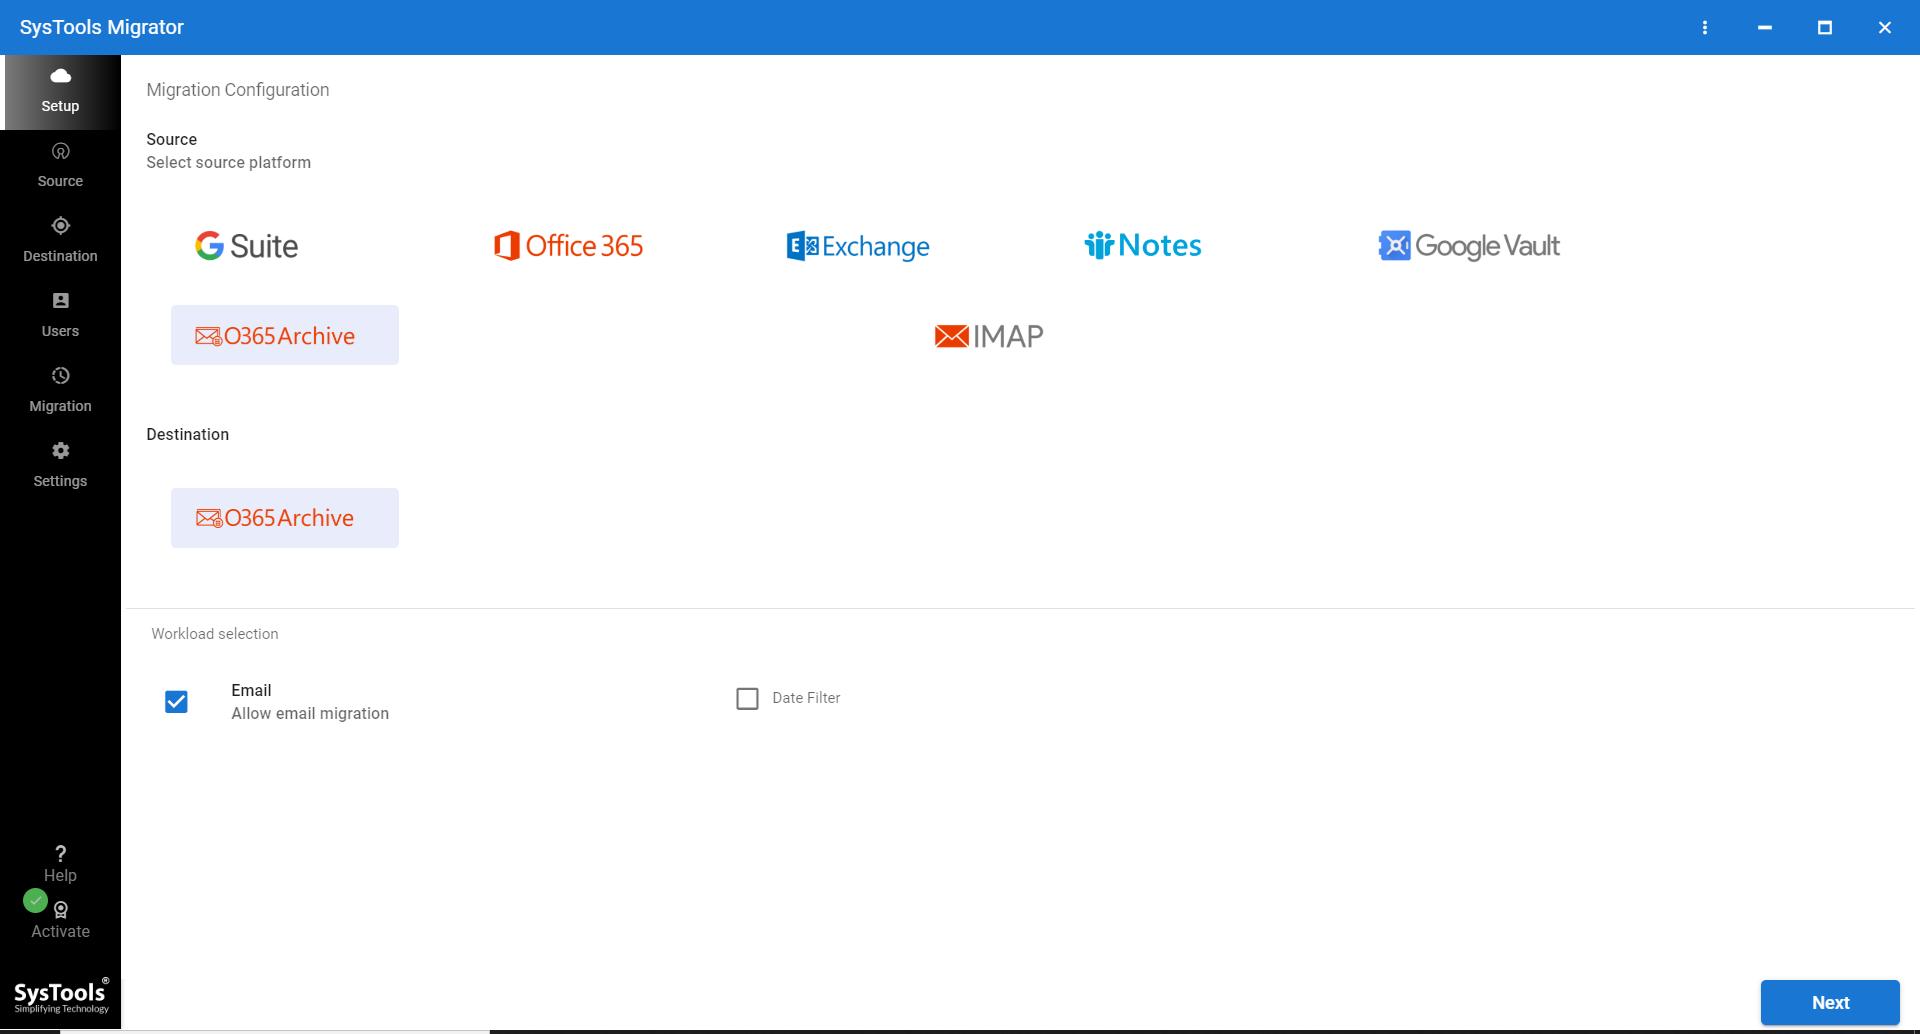 O365 archive folder migration